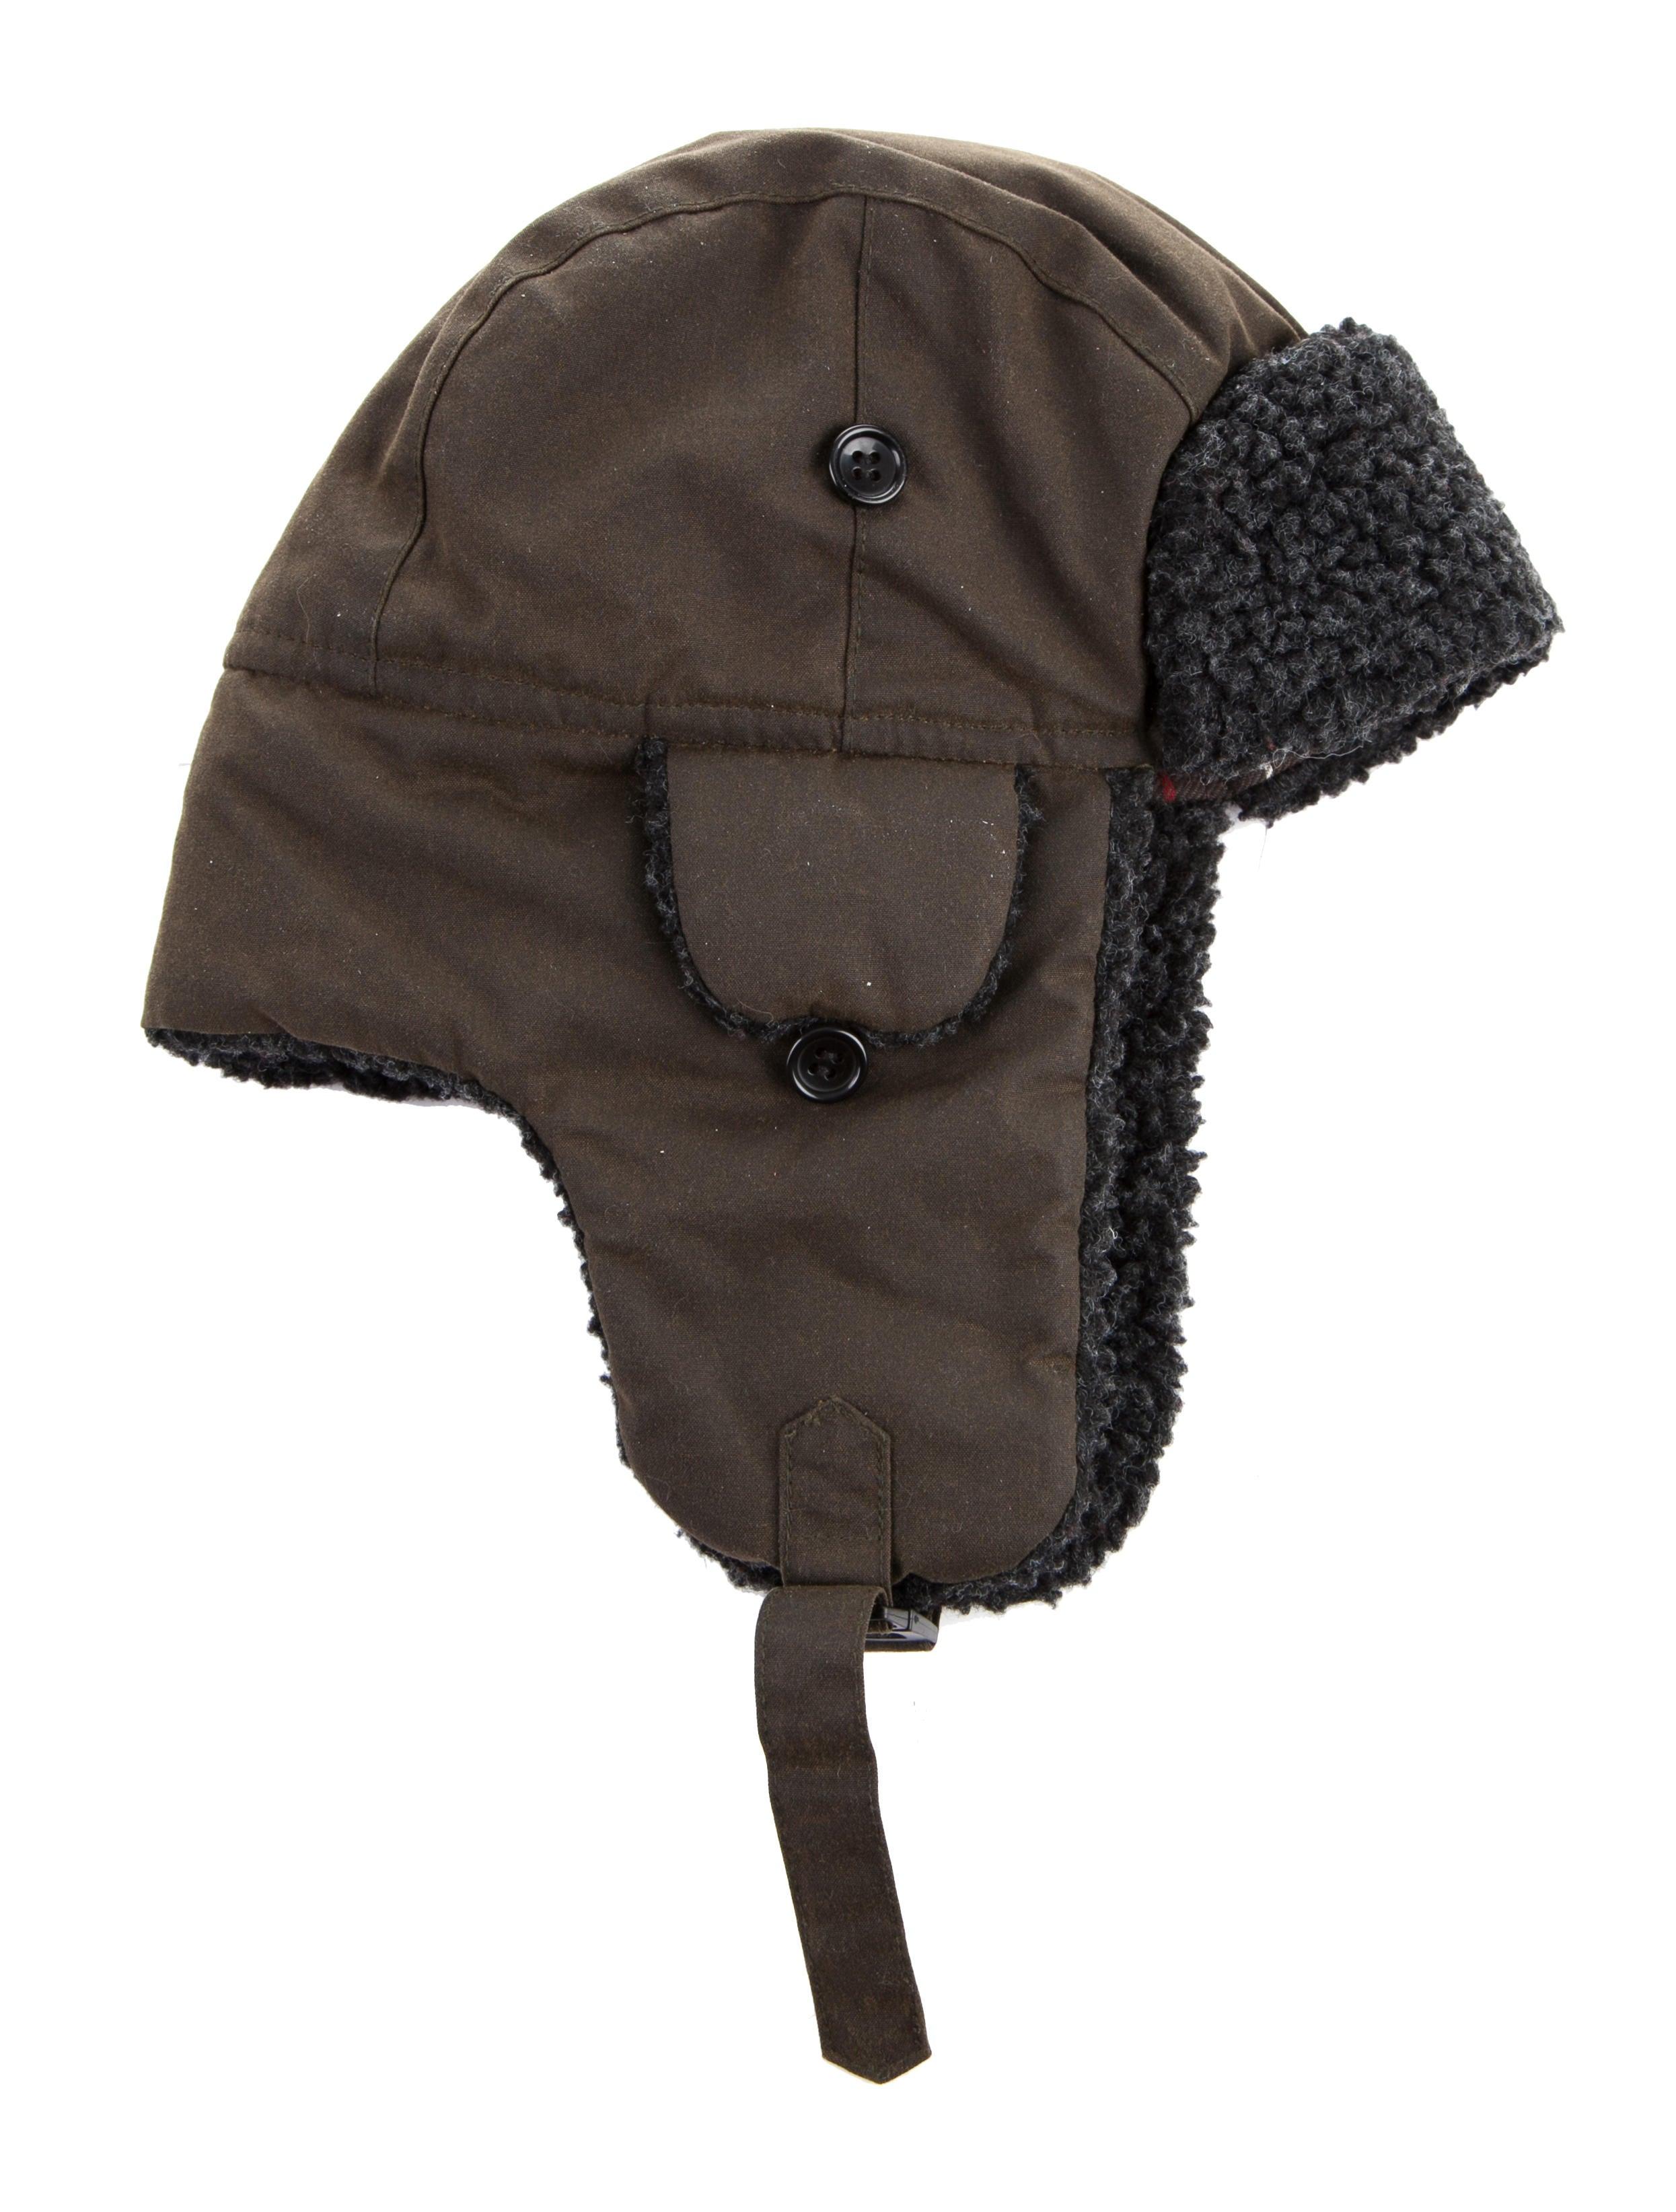 252d8ec0e08 Barbour Boys  Fleece-Lined Trapper Hat - Boys - W2U20809